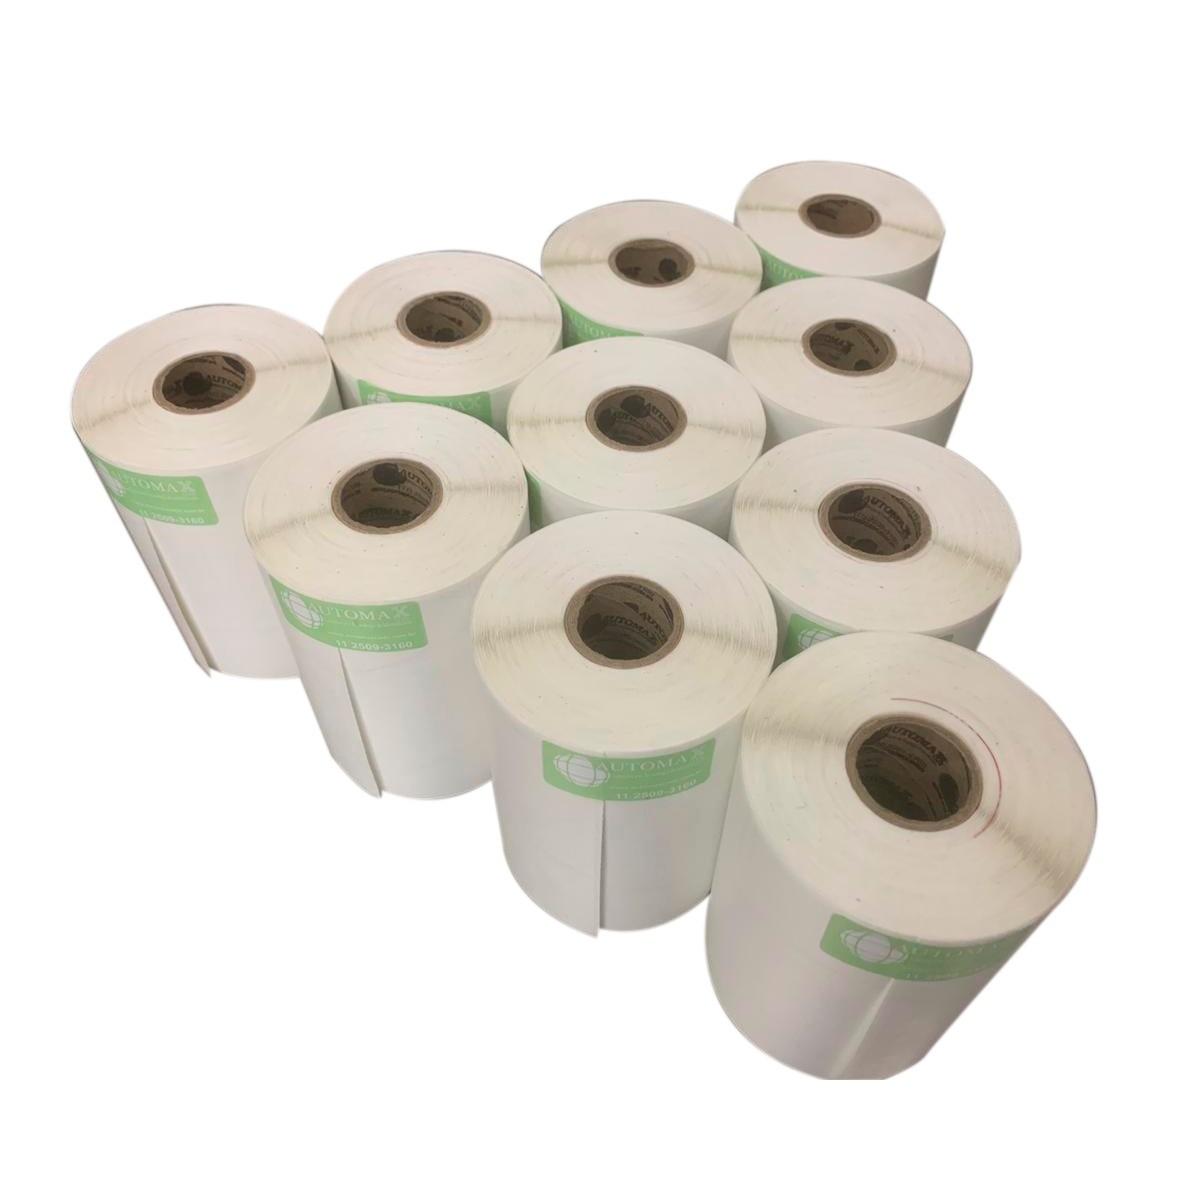 10 Rolos de Etiqueta BOPP 10x7,5cm   100mmX75mm